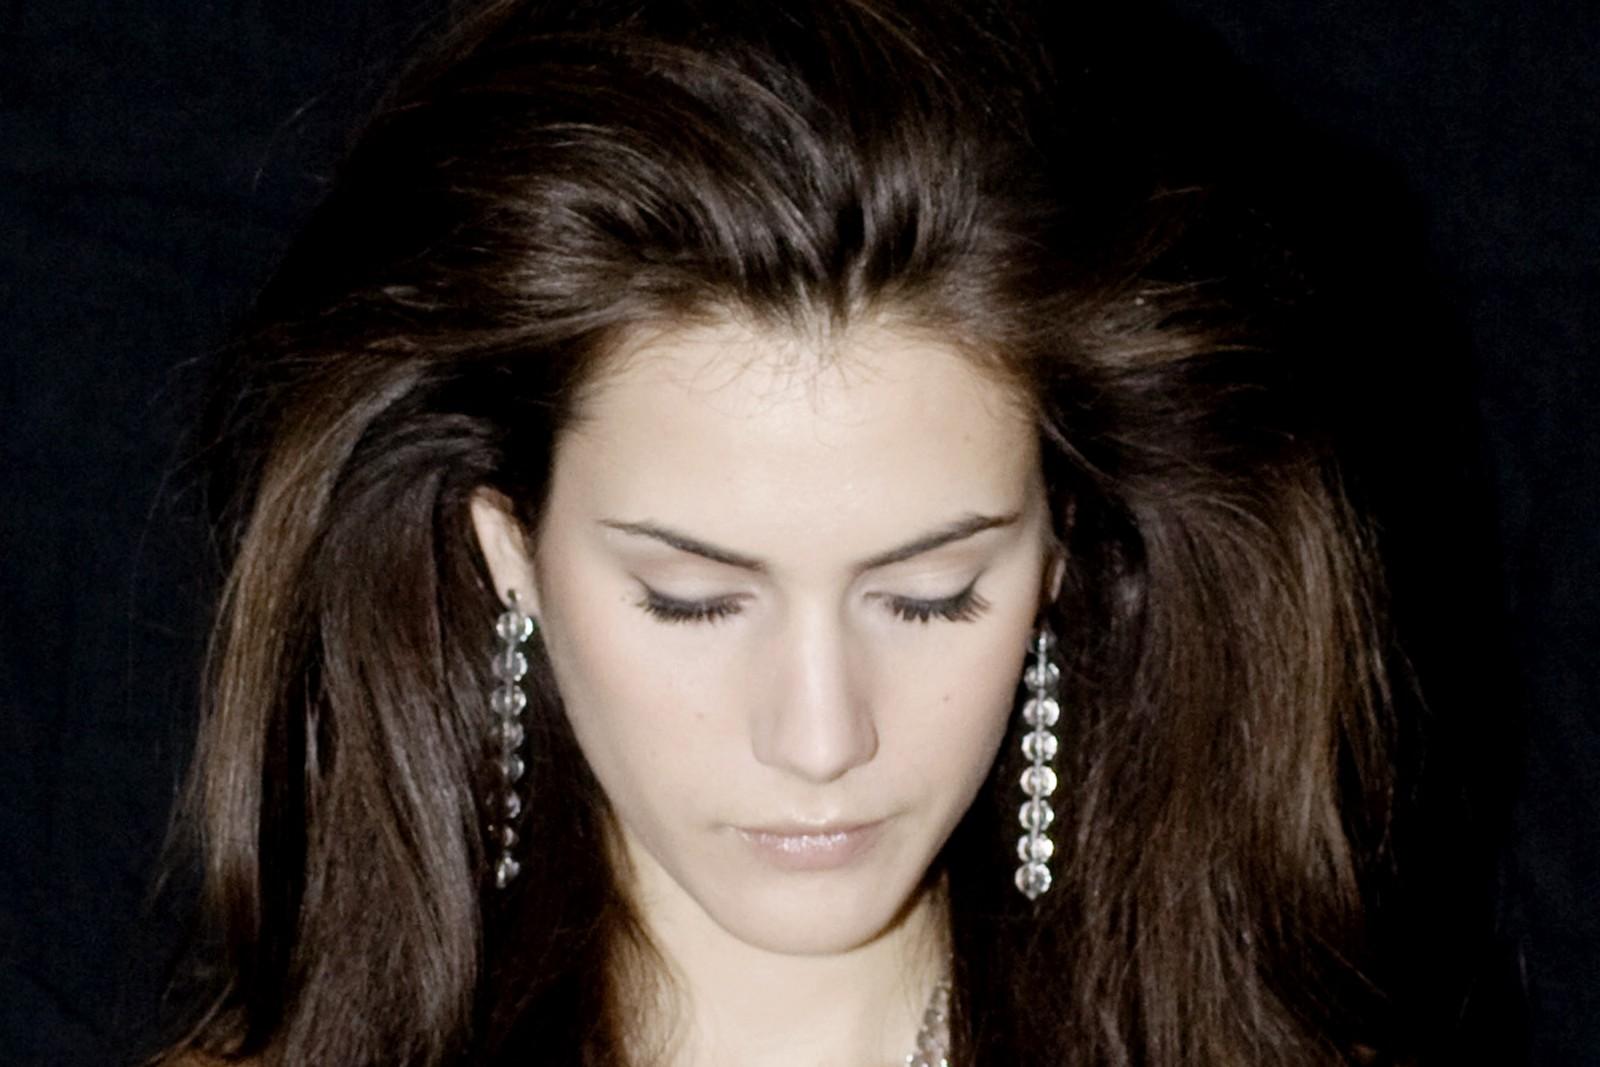 Crystal Earrings 183 Saskia Diez